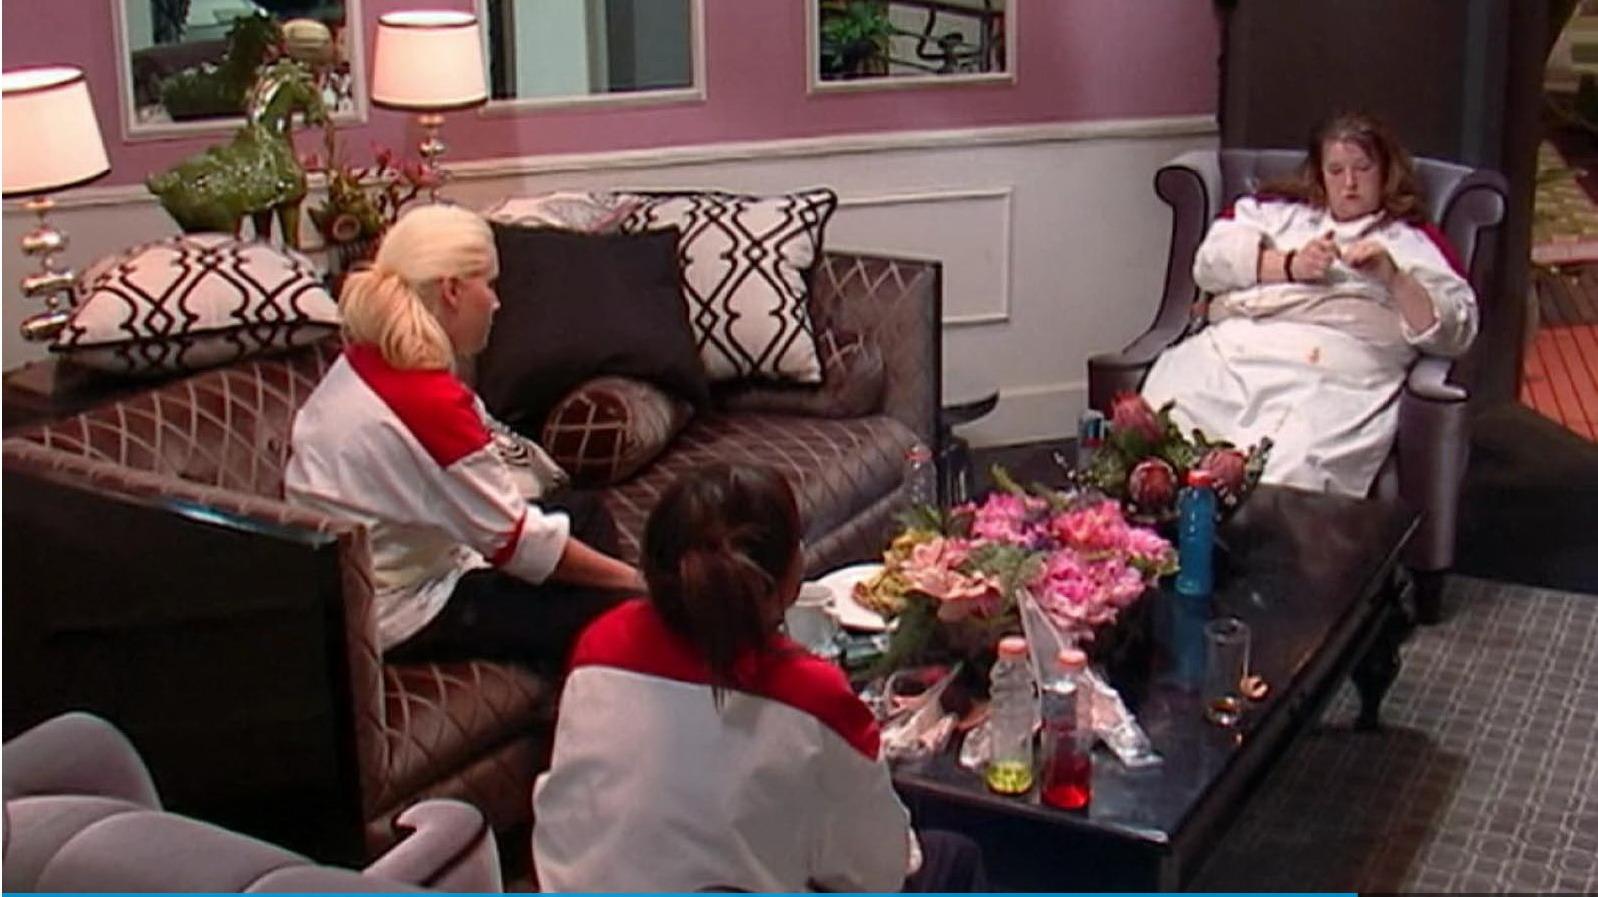 Armen Living Armen Living Barrister Sofa Chair Featured On Fox11